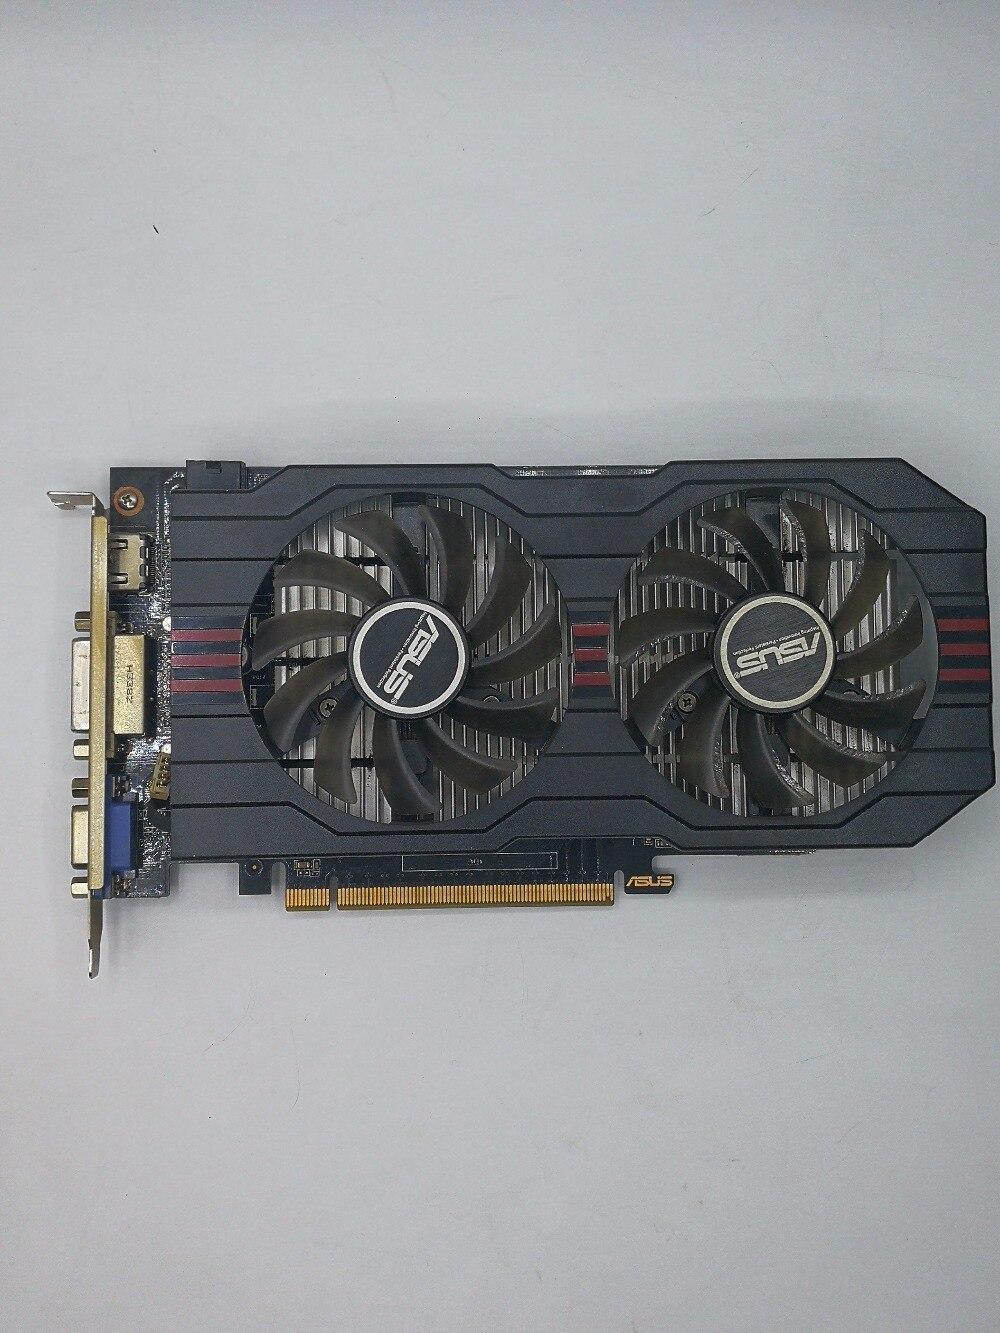 Usado, original Asus GTX650TI tarjeta gráfica GPU 1 GB GDDR5 128BIT tarjeta VGA juego más fuerte que GT630, GT730